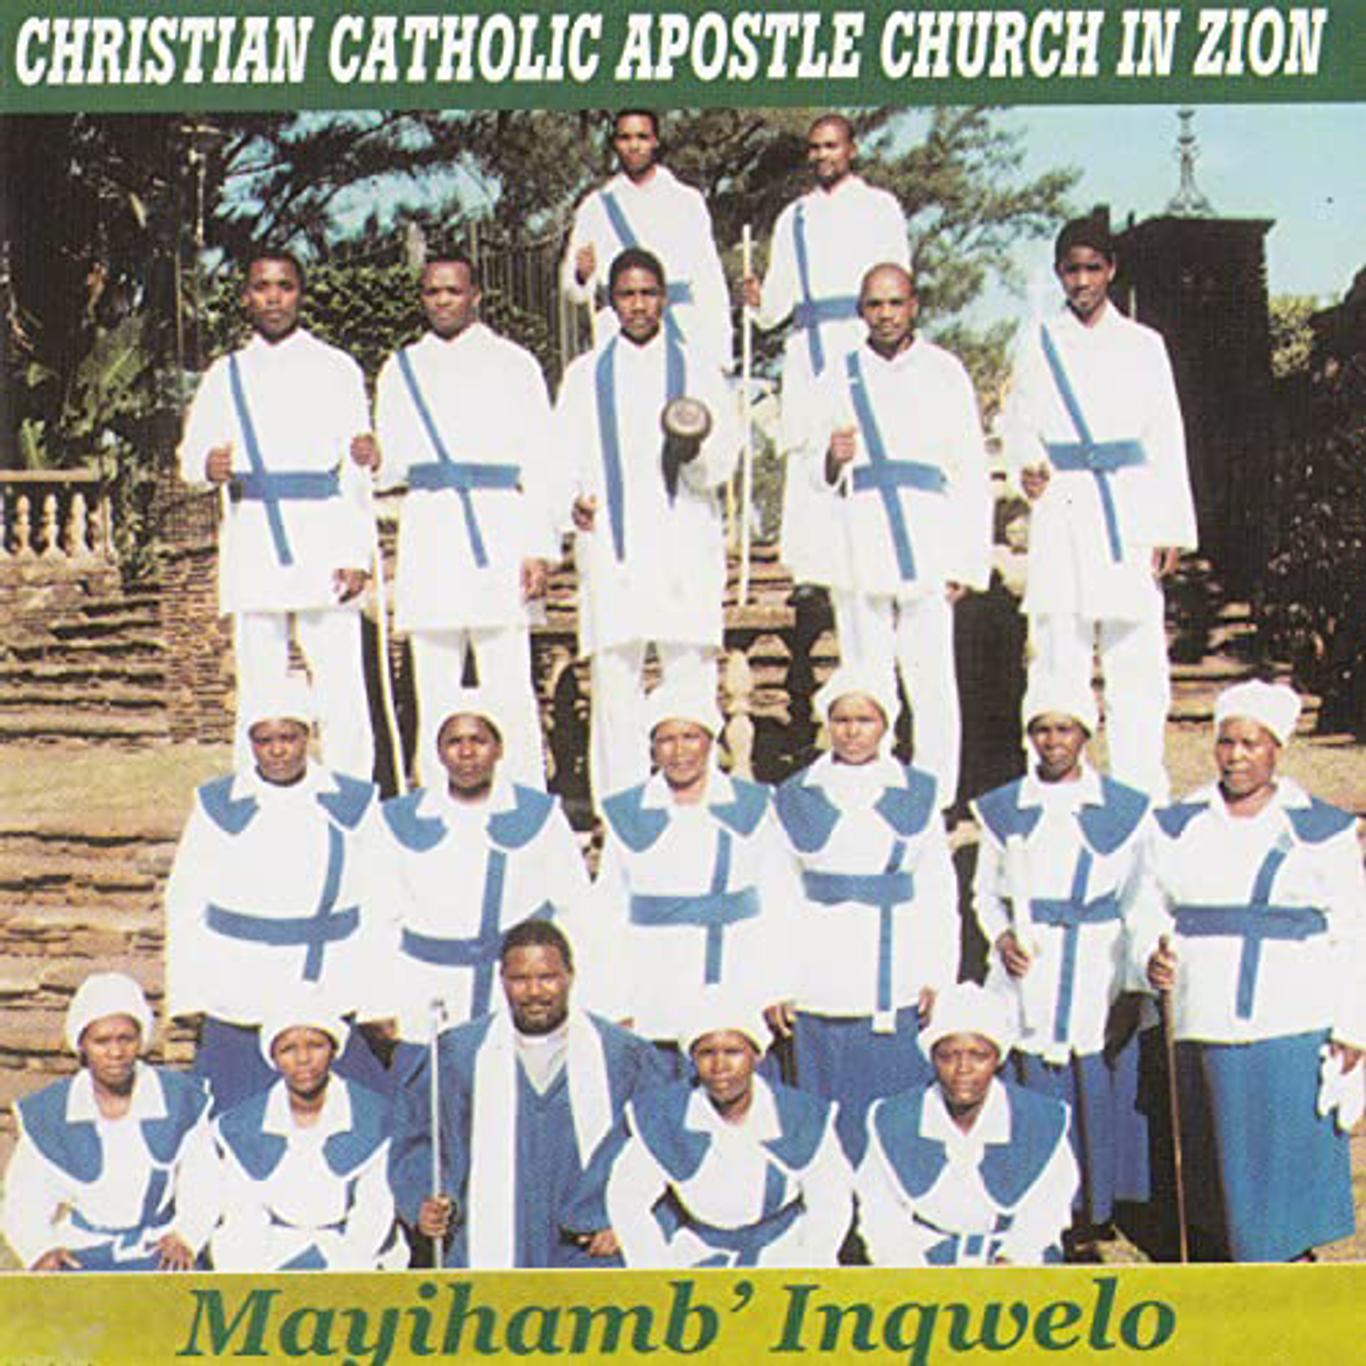 Christian Catholic Apostle Church In Zion